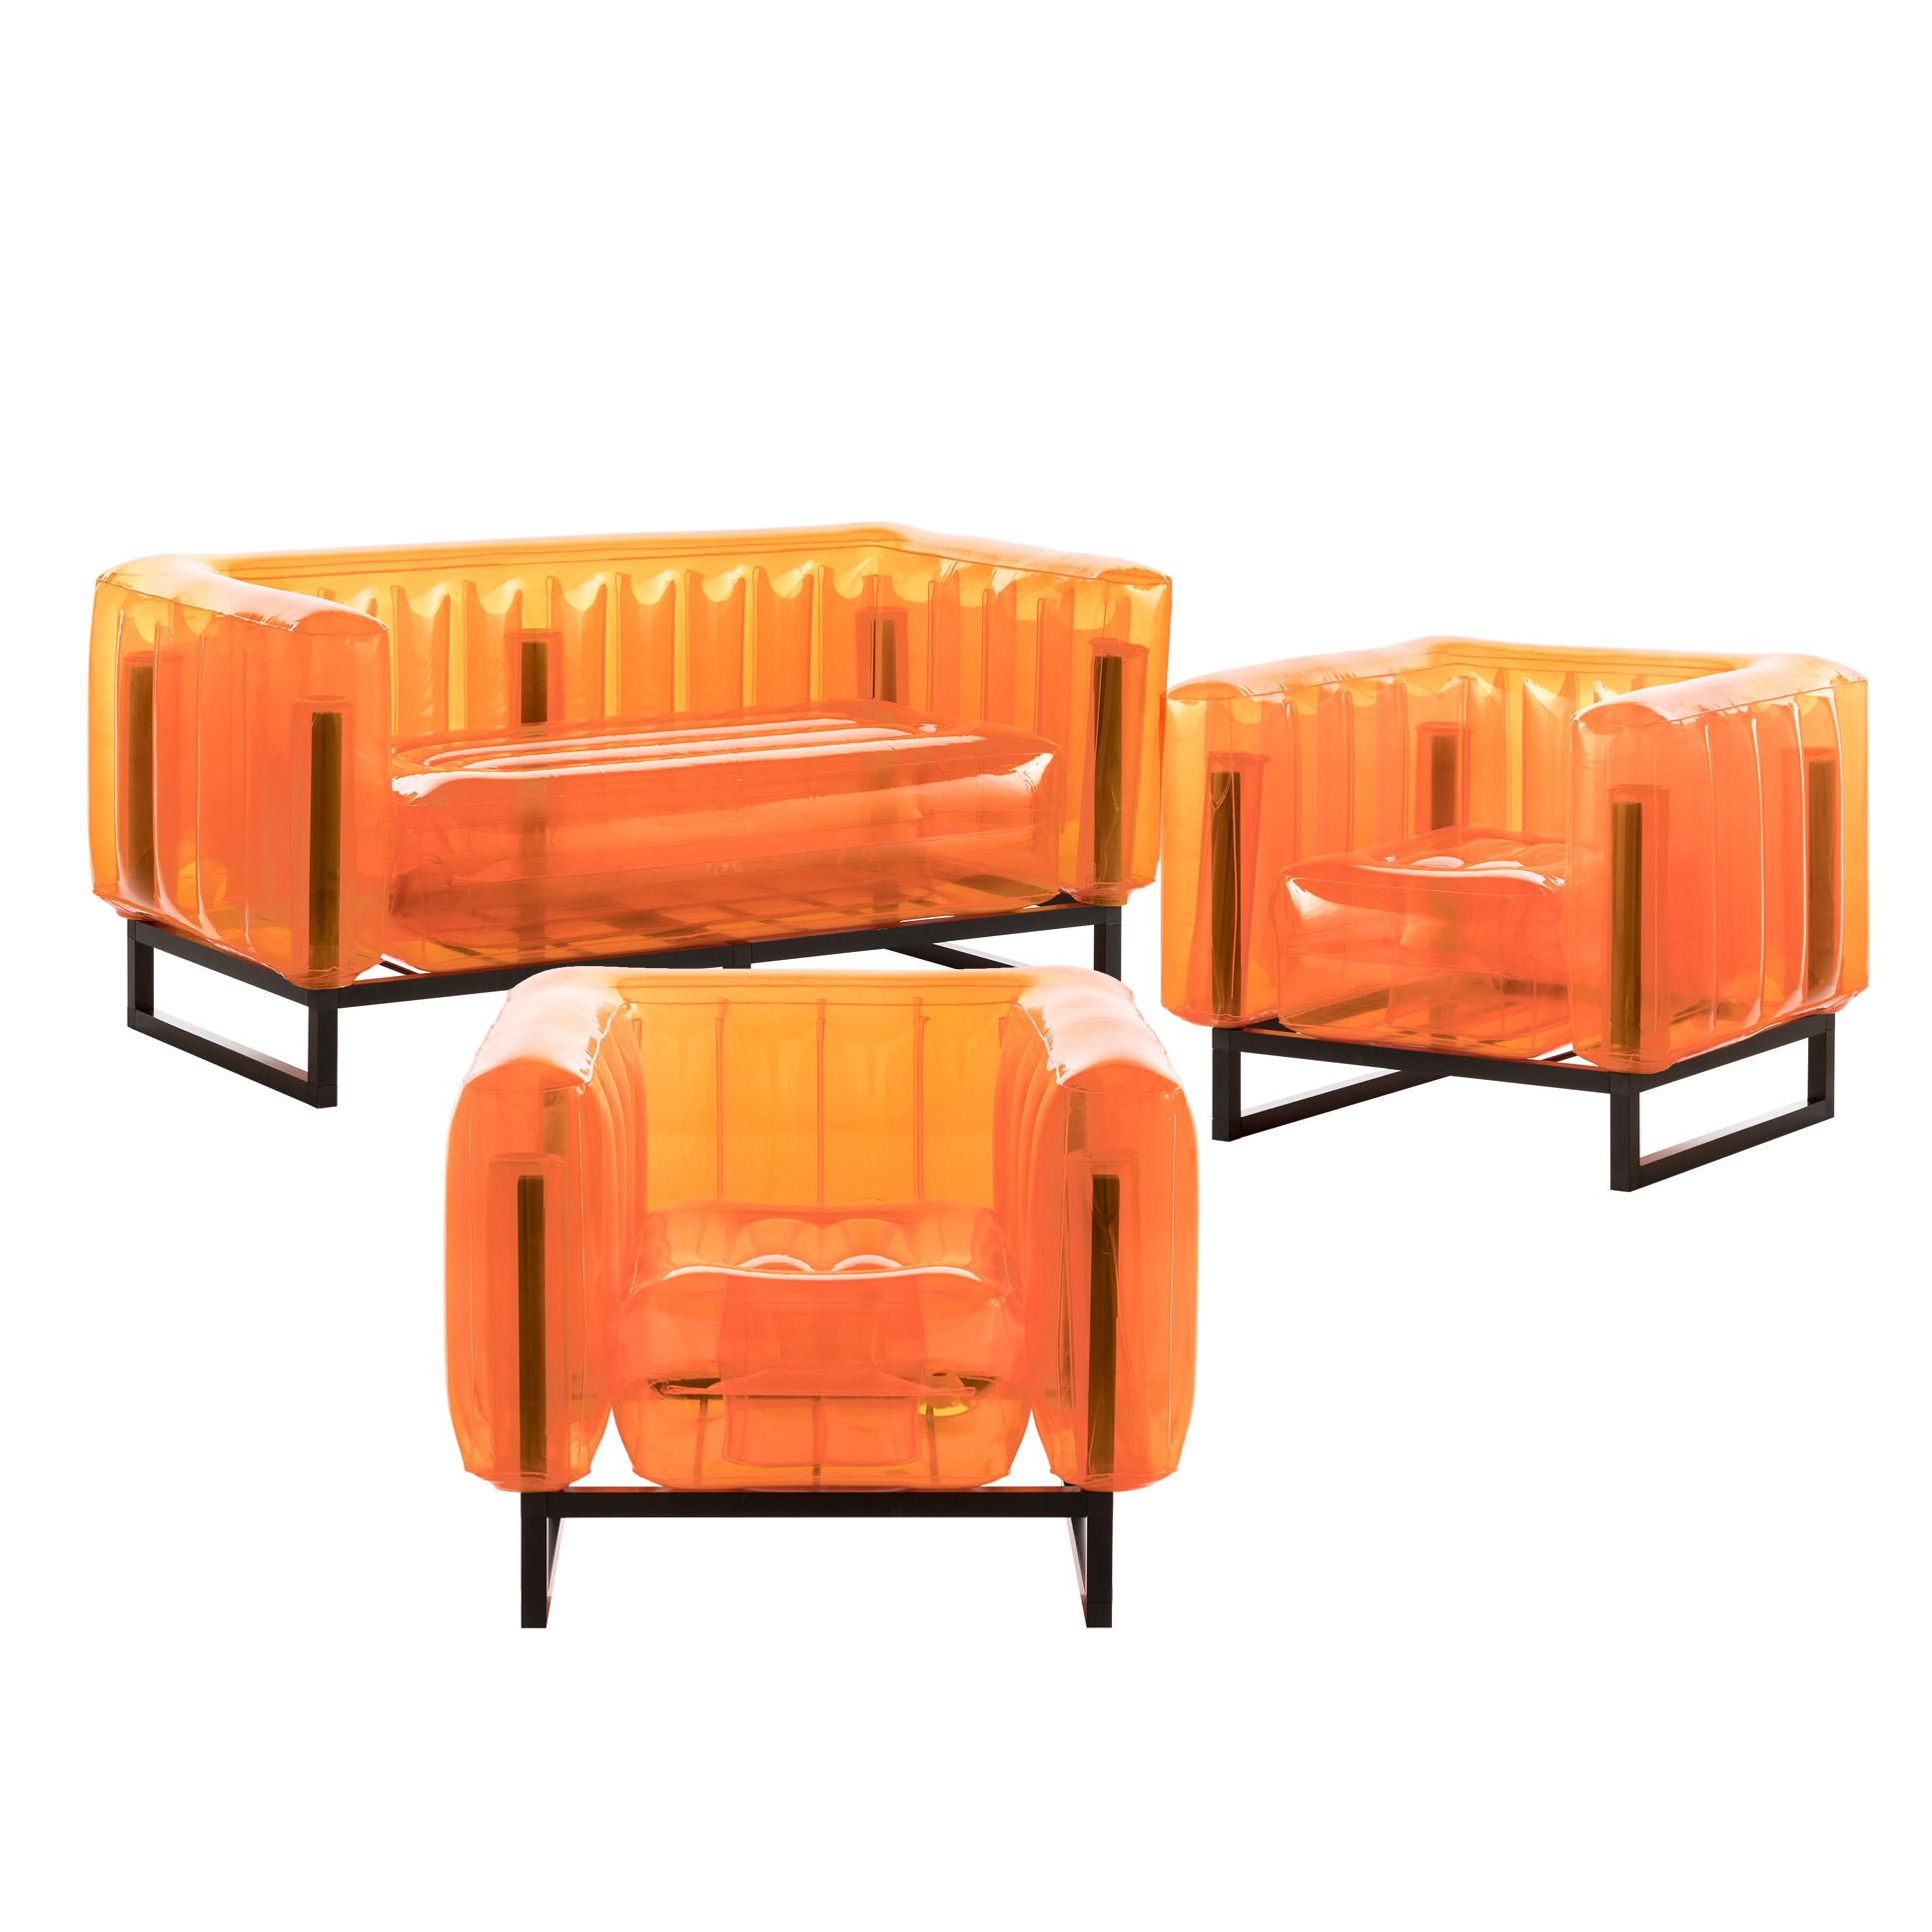 Salon de jardin design 1 canapé et 2 fauteuils oranges cadre aluminium